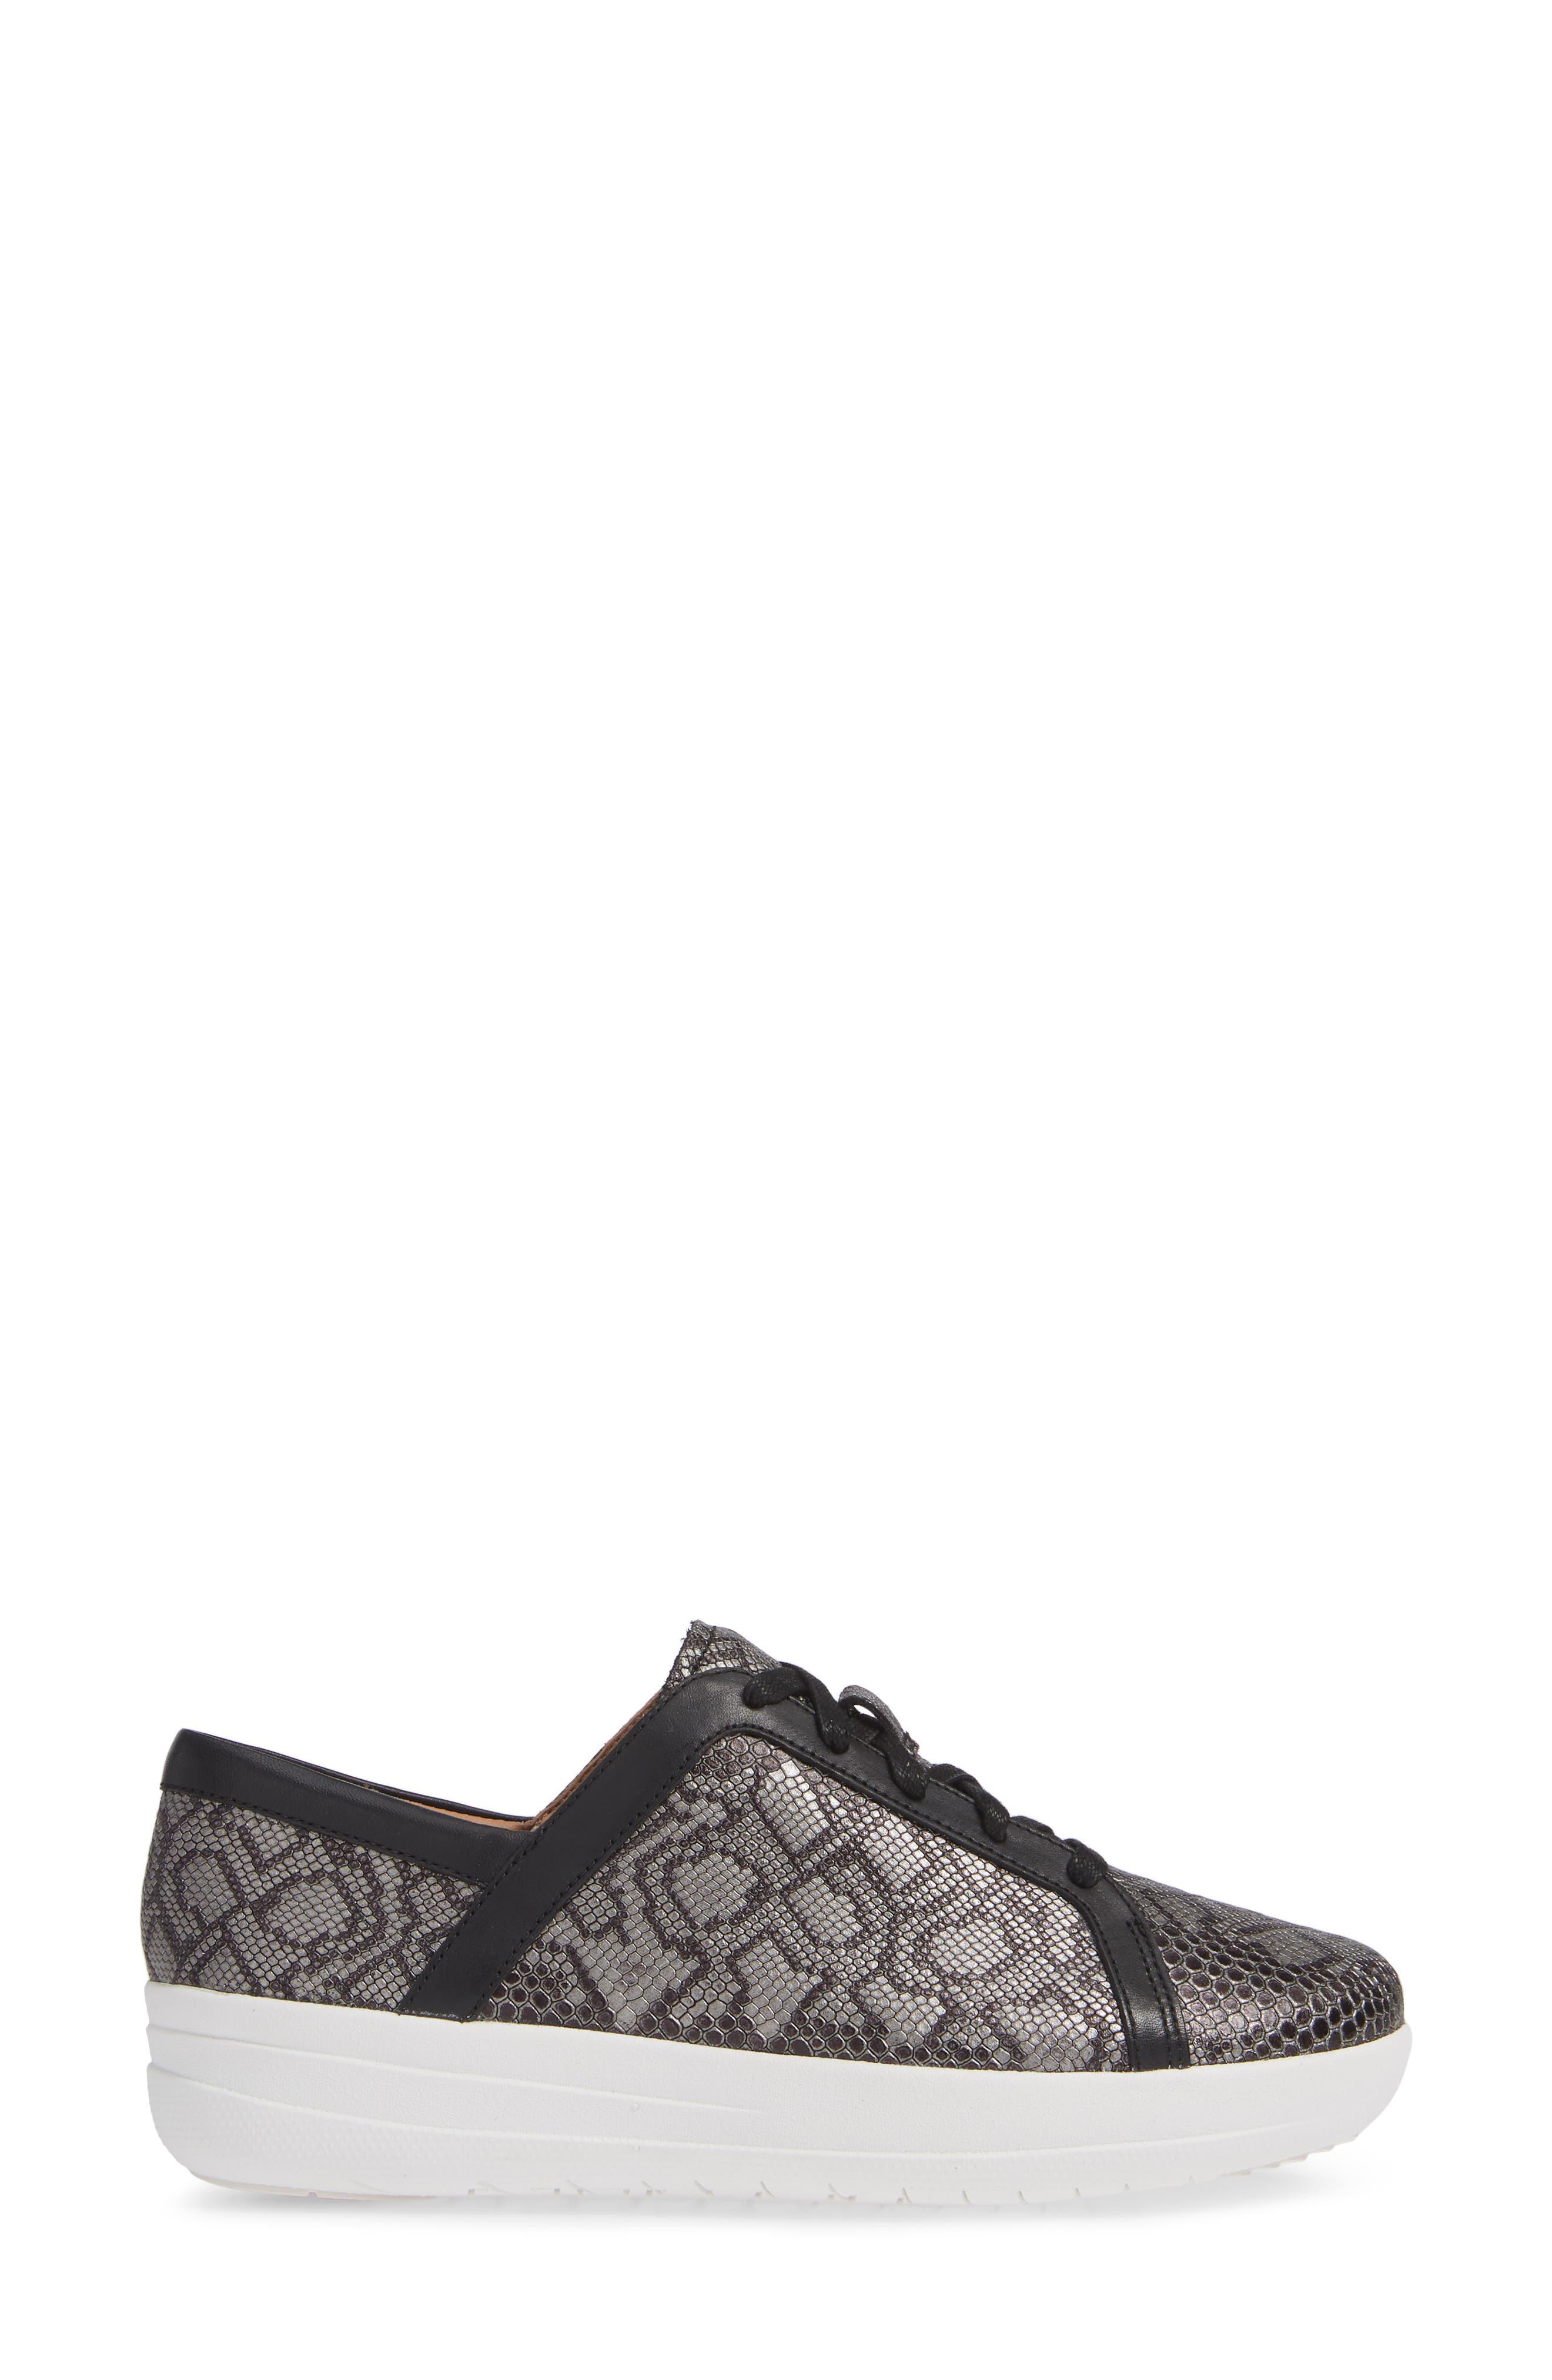 FITFLOP,                             F-Sporty II Sneaker,                             Alternate thumbnail 3, color,                             001